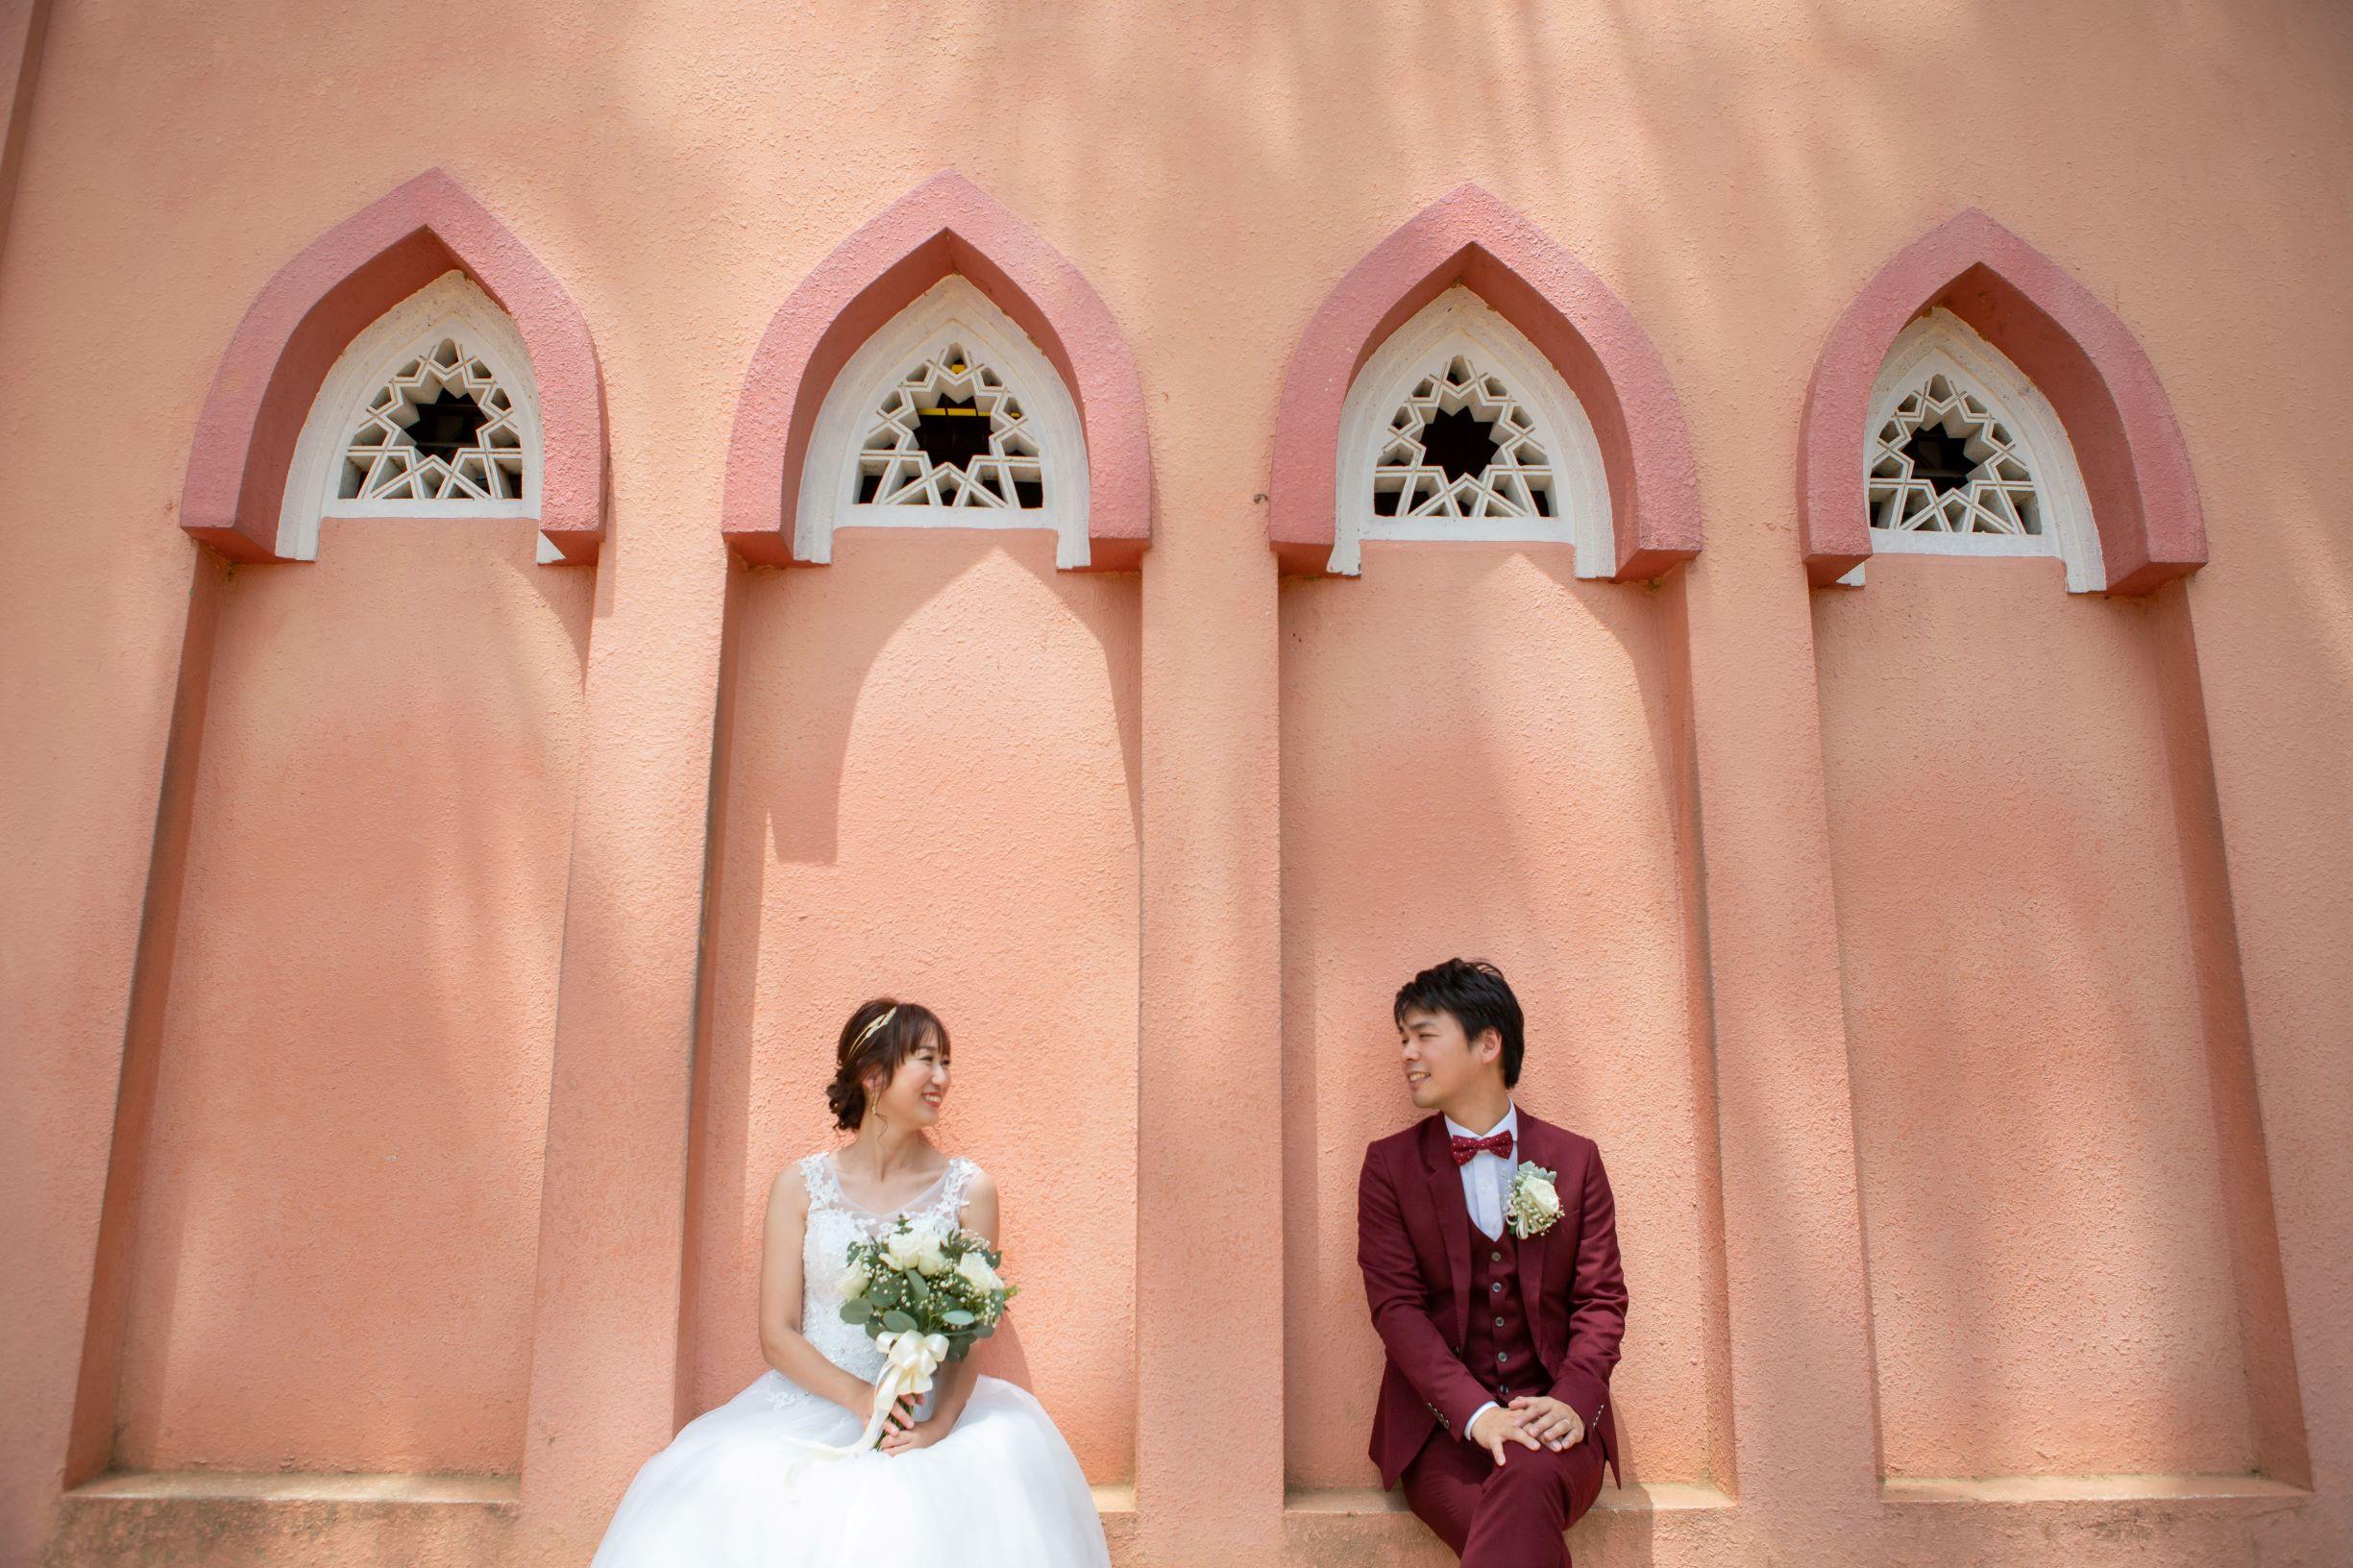 Malaysia, asia, malausia wedding, prewedding photoshoot, overseawedding, beach, garden, wedding, weddings, married,